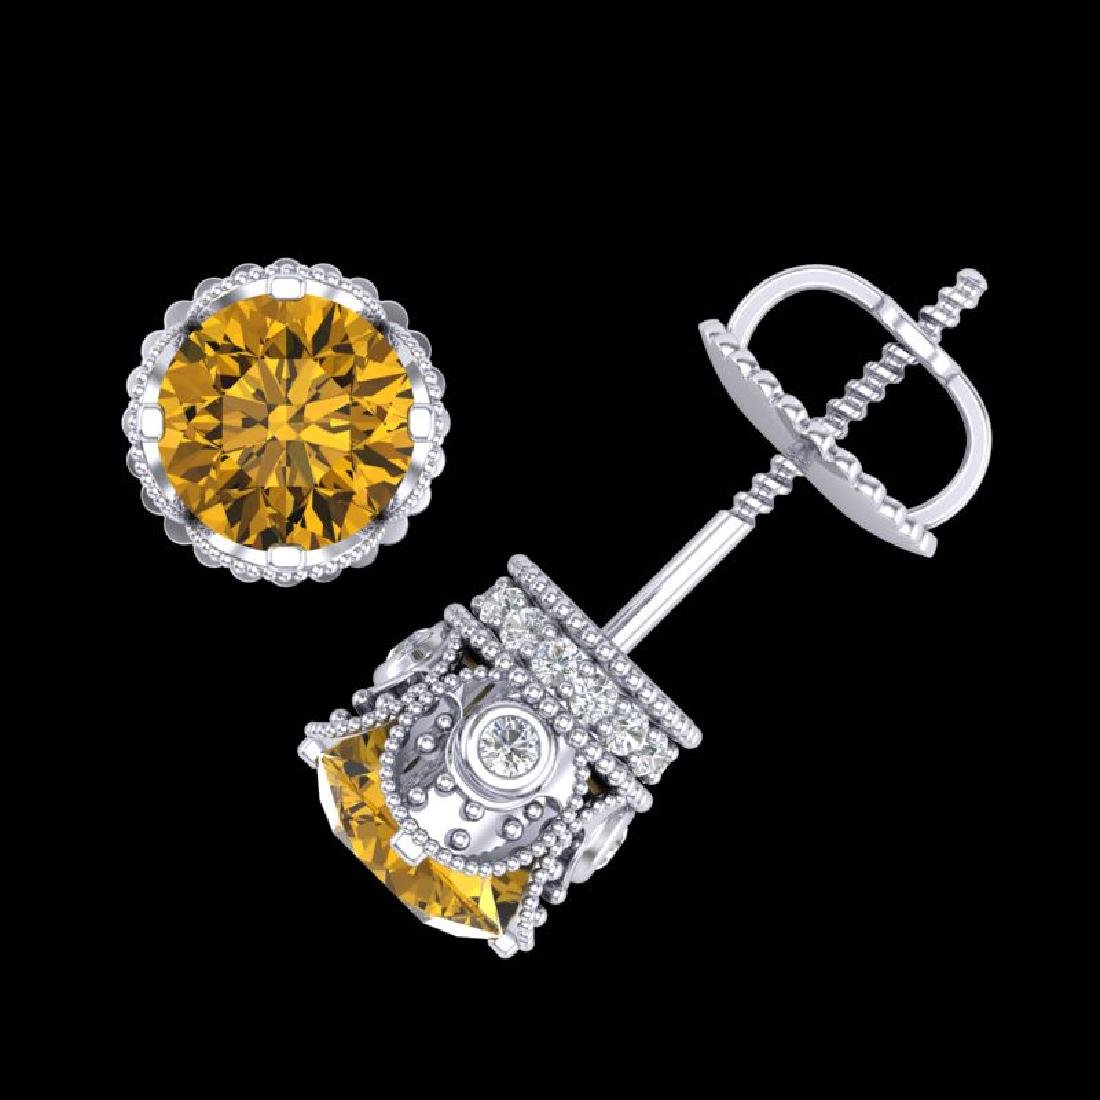 1.85 CTW Intense Fancy Yellow Diamond Art Deco Stud - 3